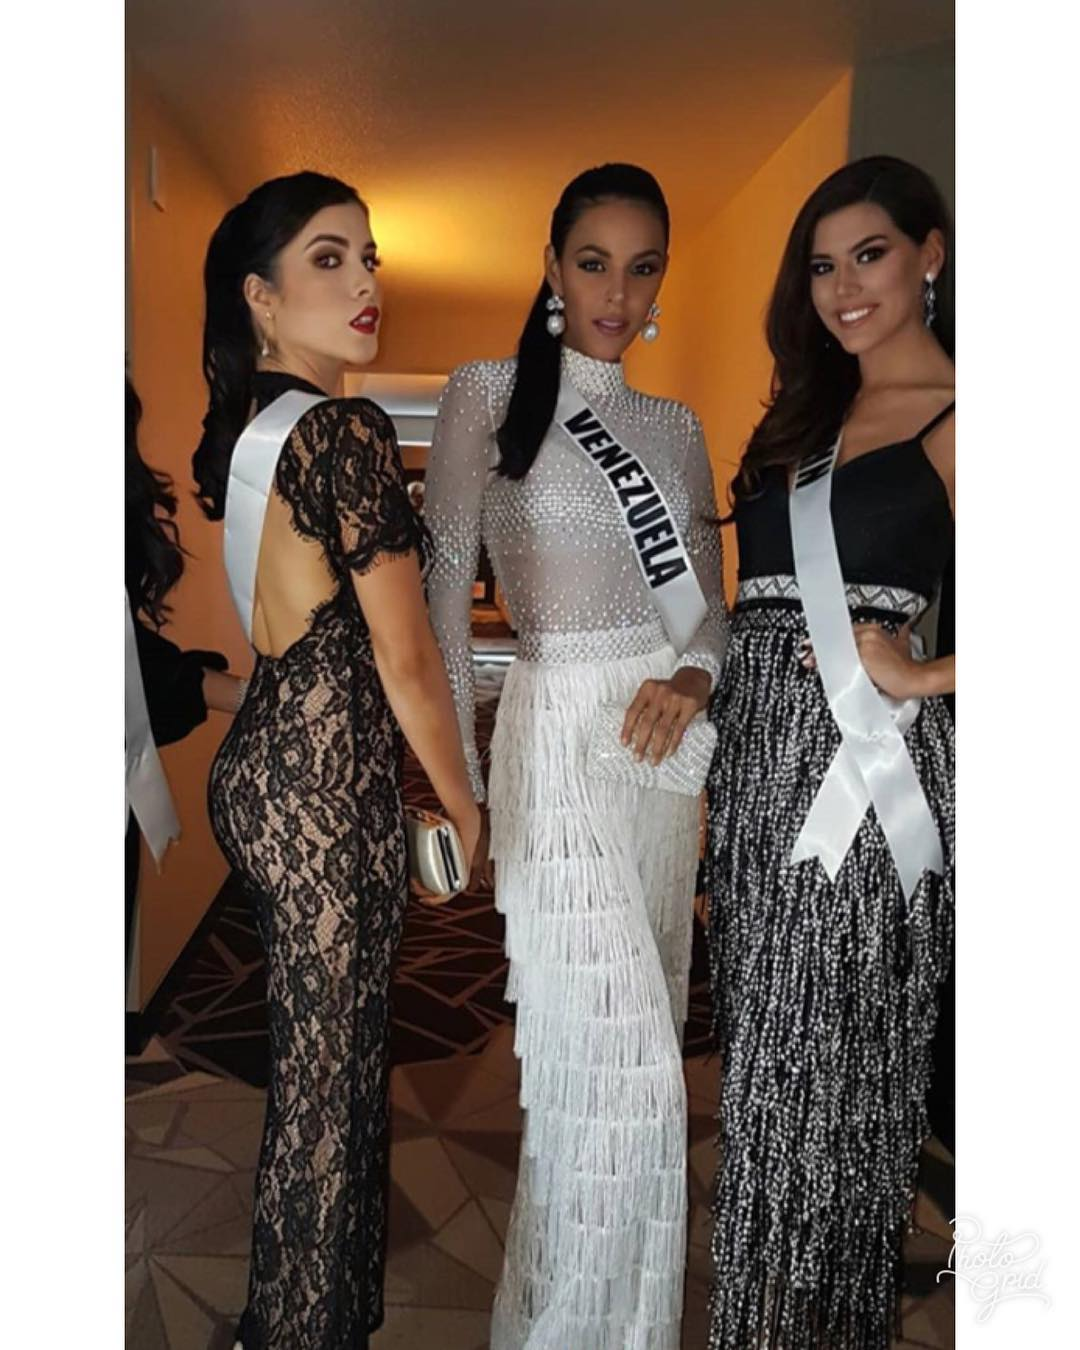 sofia del prado, top 10 de miss universe 2017/reyna hispanoamericana 2015/miss charm spain 2021. - Página 6 23507414